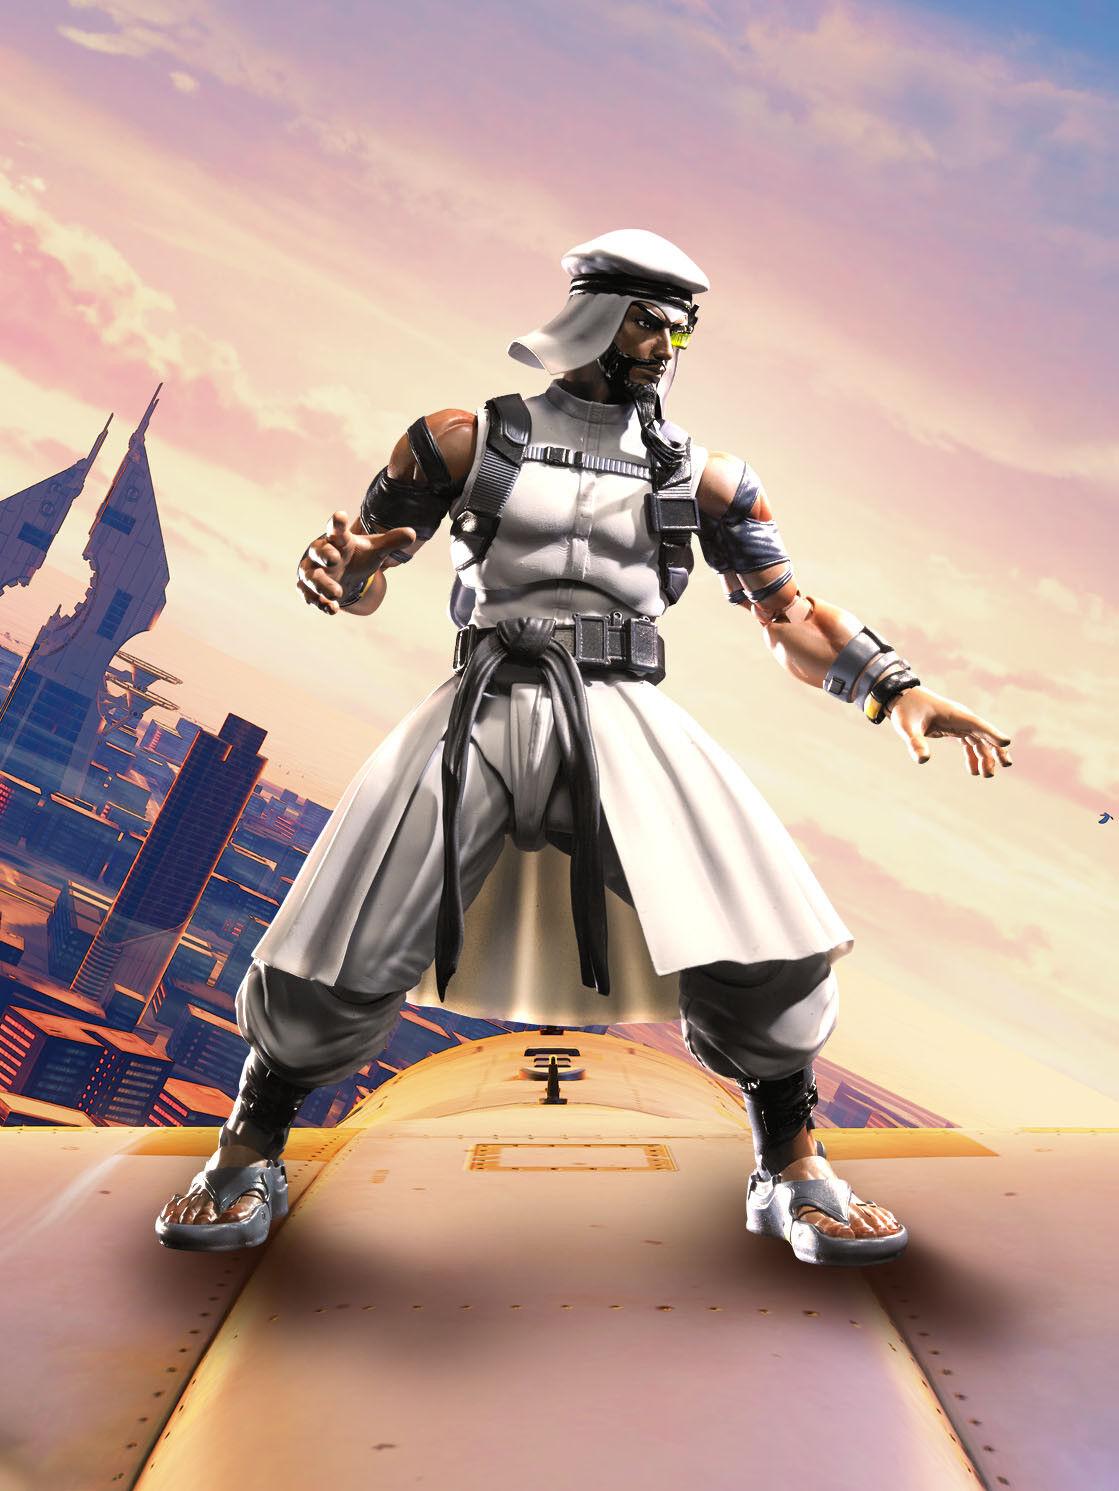 Street Rashid Fighter V - Rashid Street S.H. Figuarts Action Figure (Bandai/Tamashii Nations) 7e190d